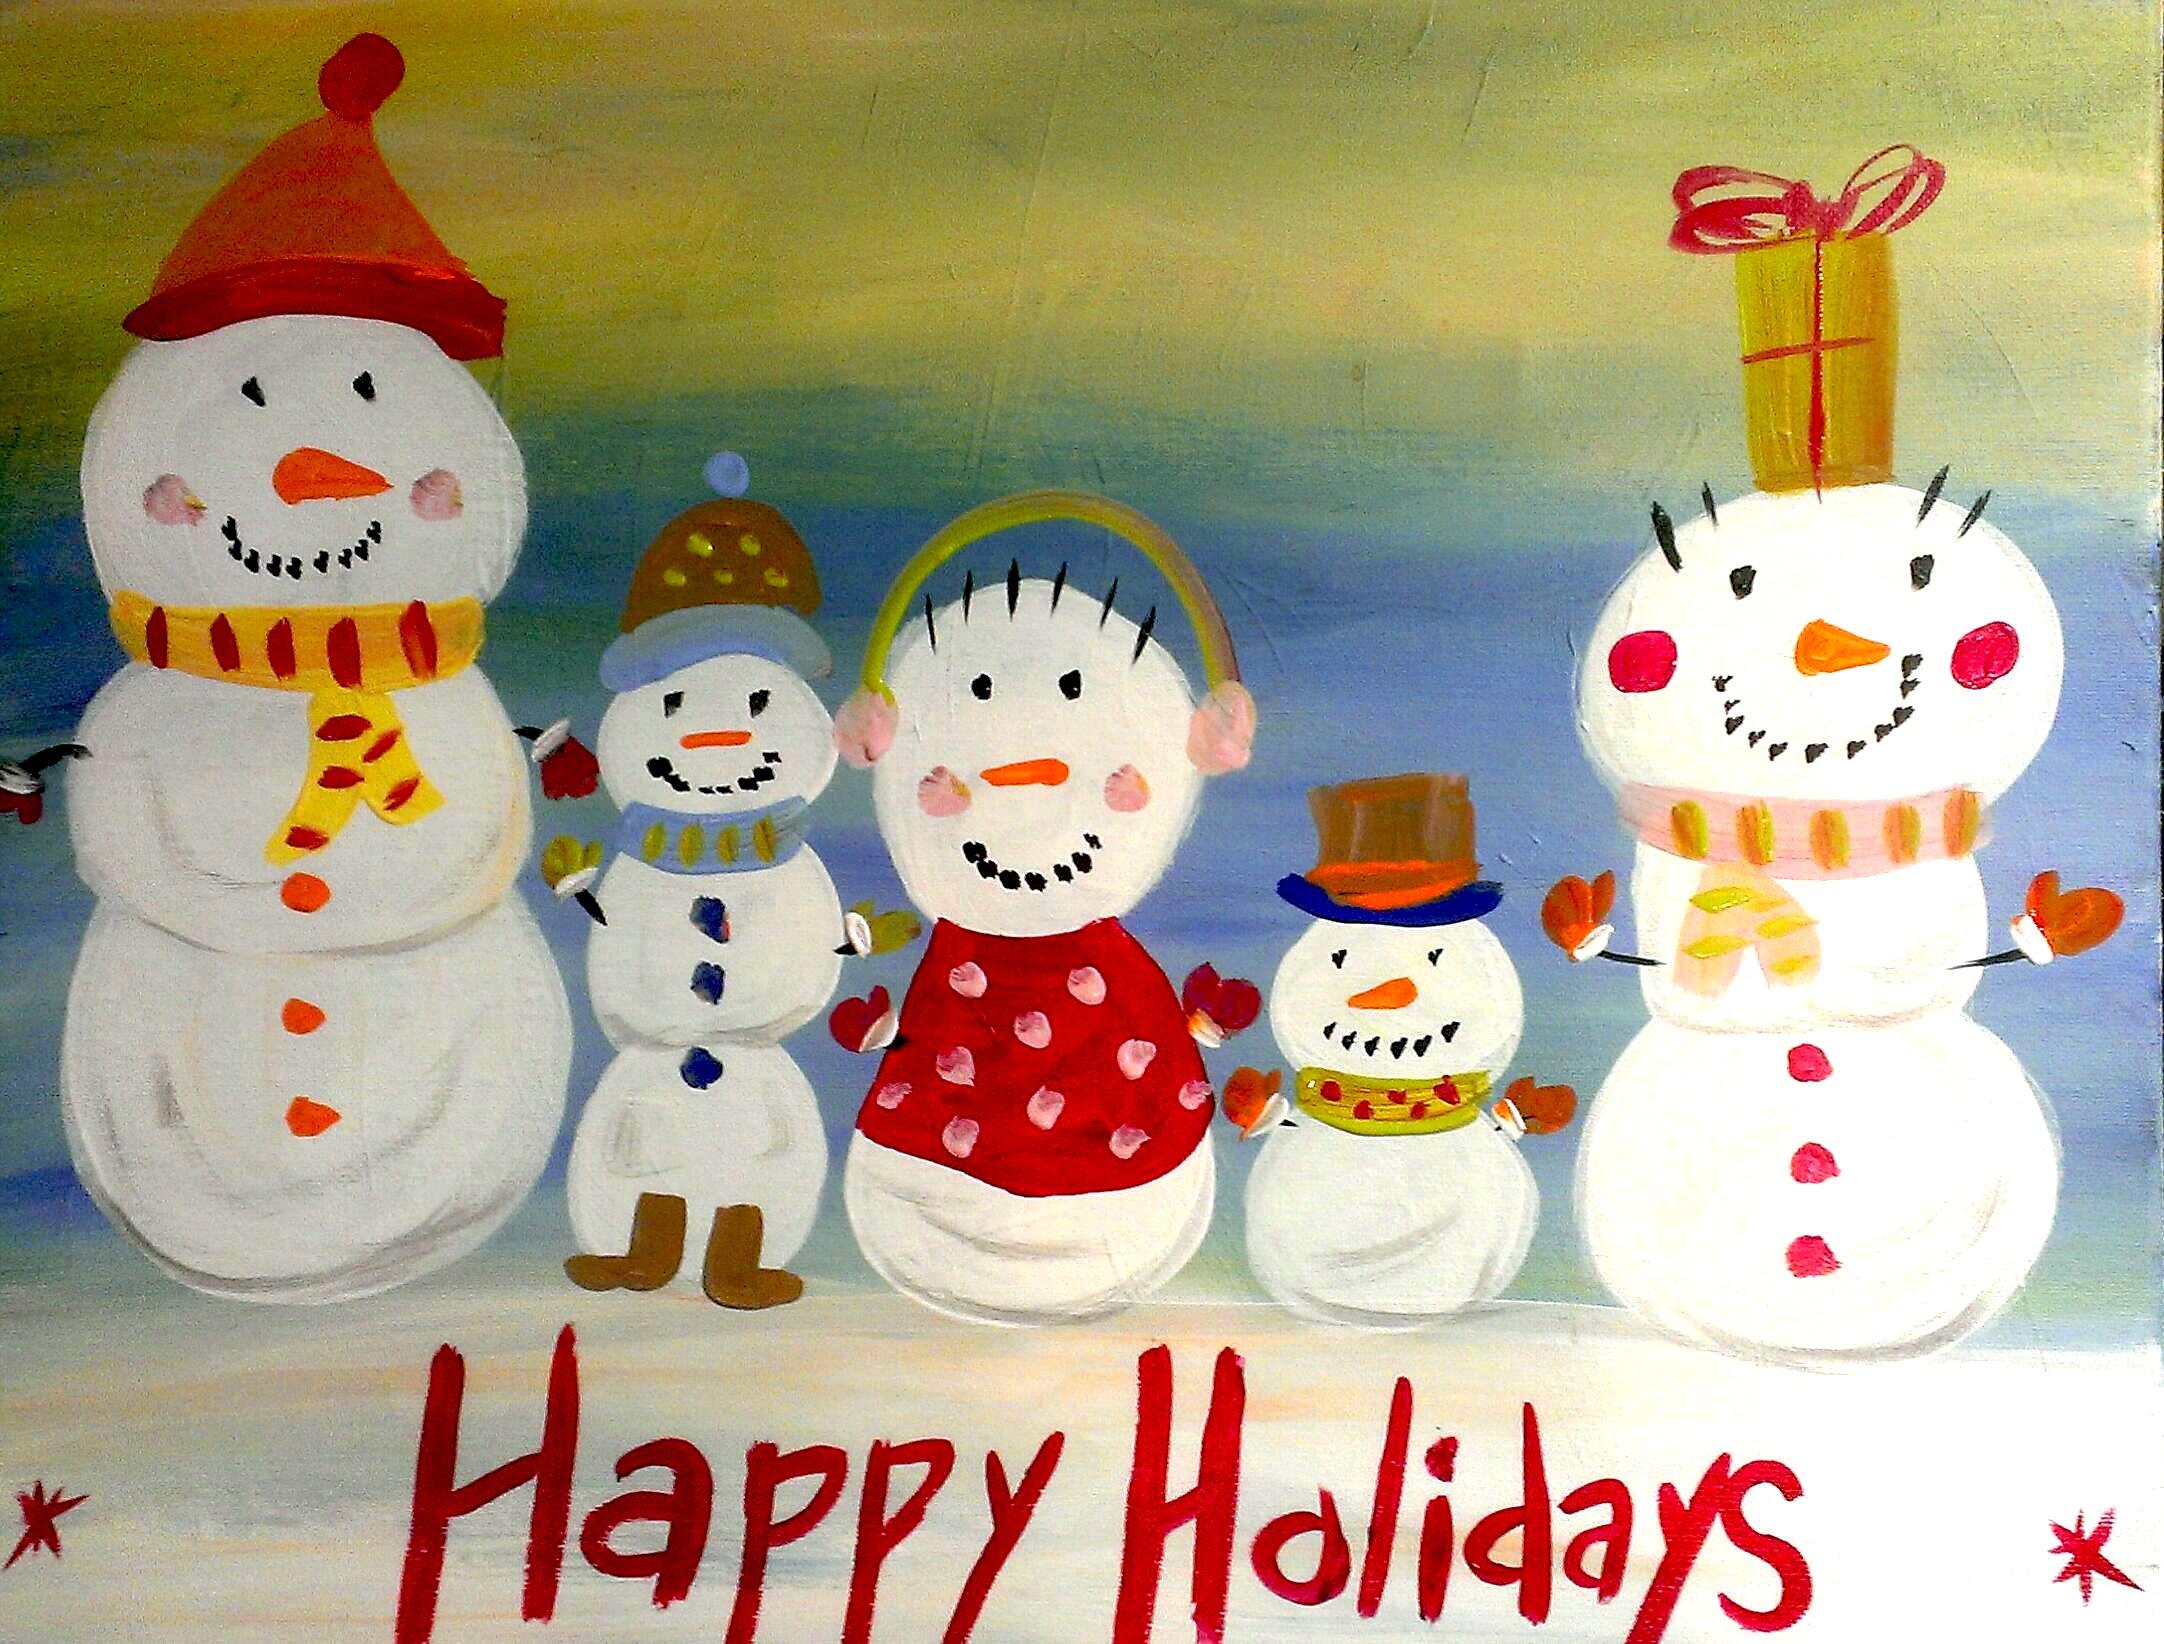 Snowman Family.jpg